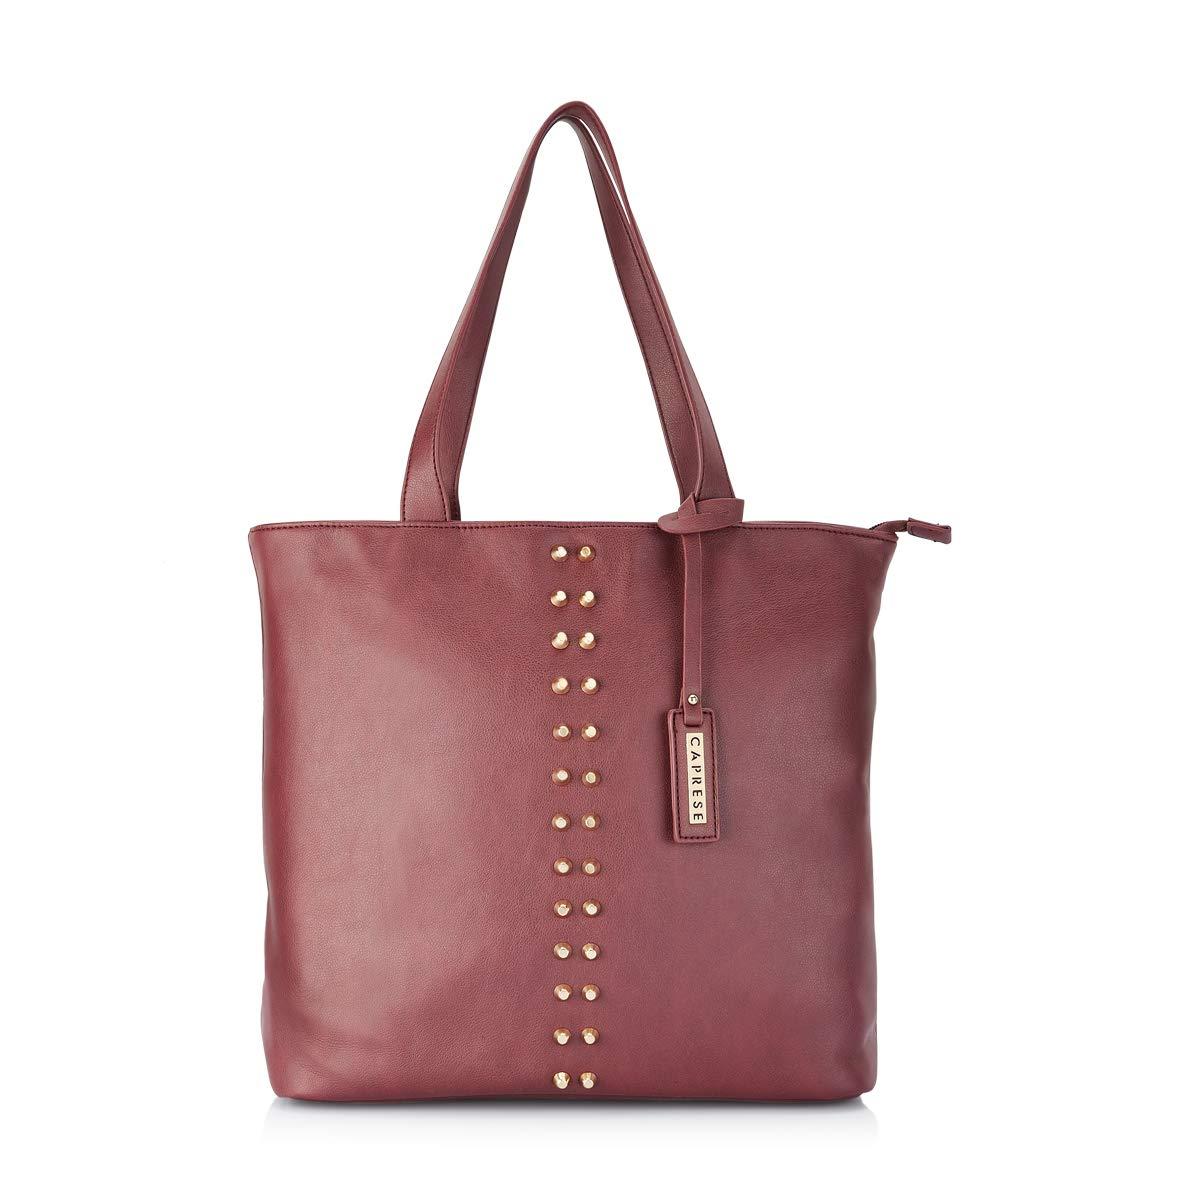 7ed8b0511b Caprese Vienna Women s Tote Bag (Plum)  Amazon.in  Shoes   Handbags